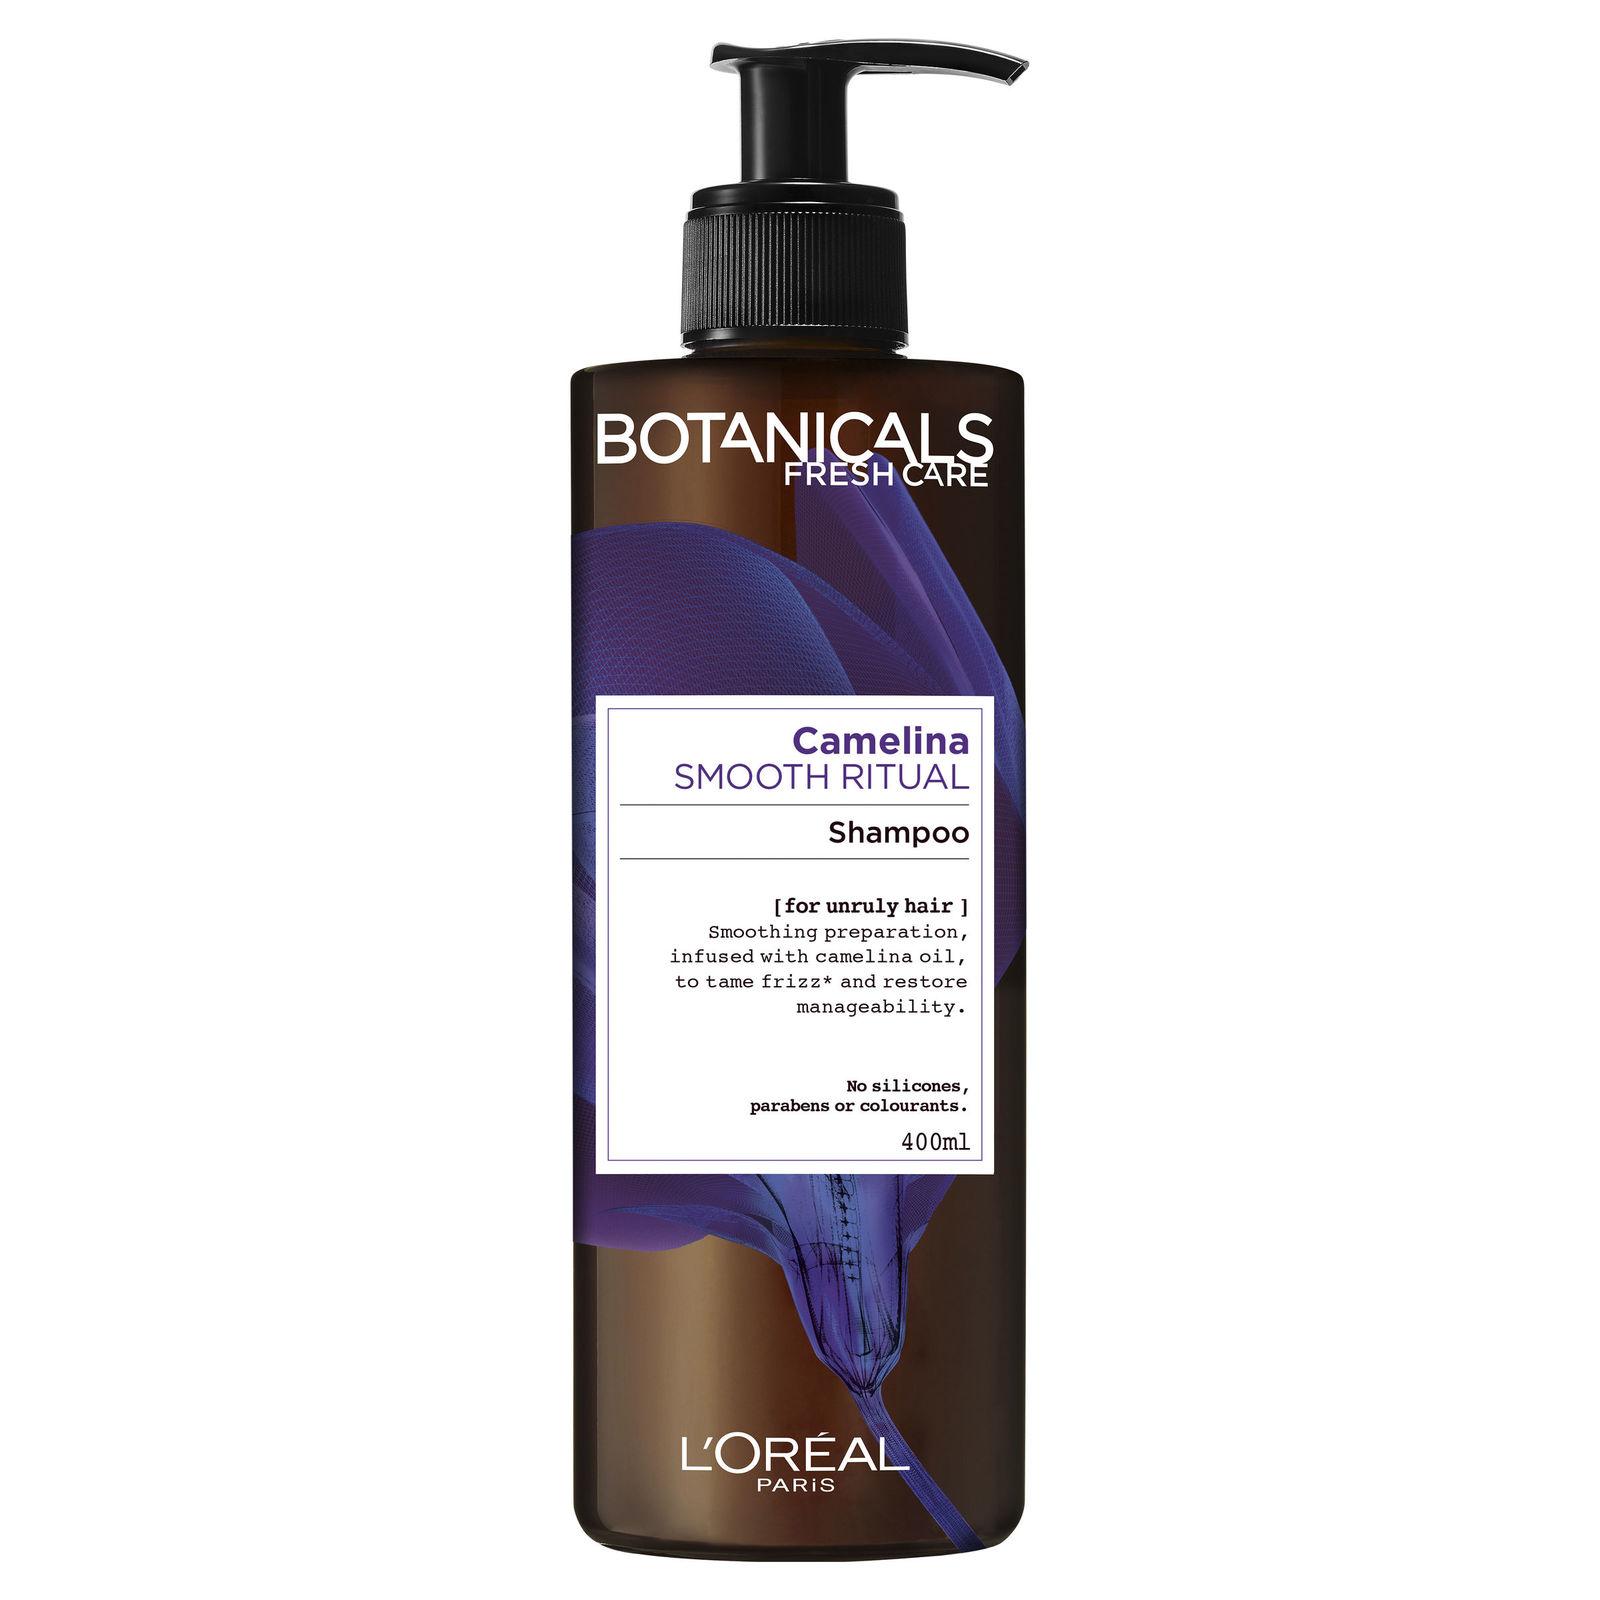 L'Oreal Botanicals - Smooth Ritual Shampoo (400ml) image